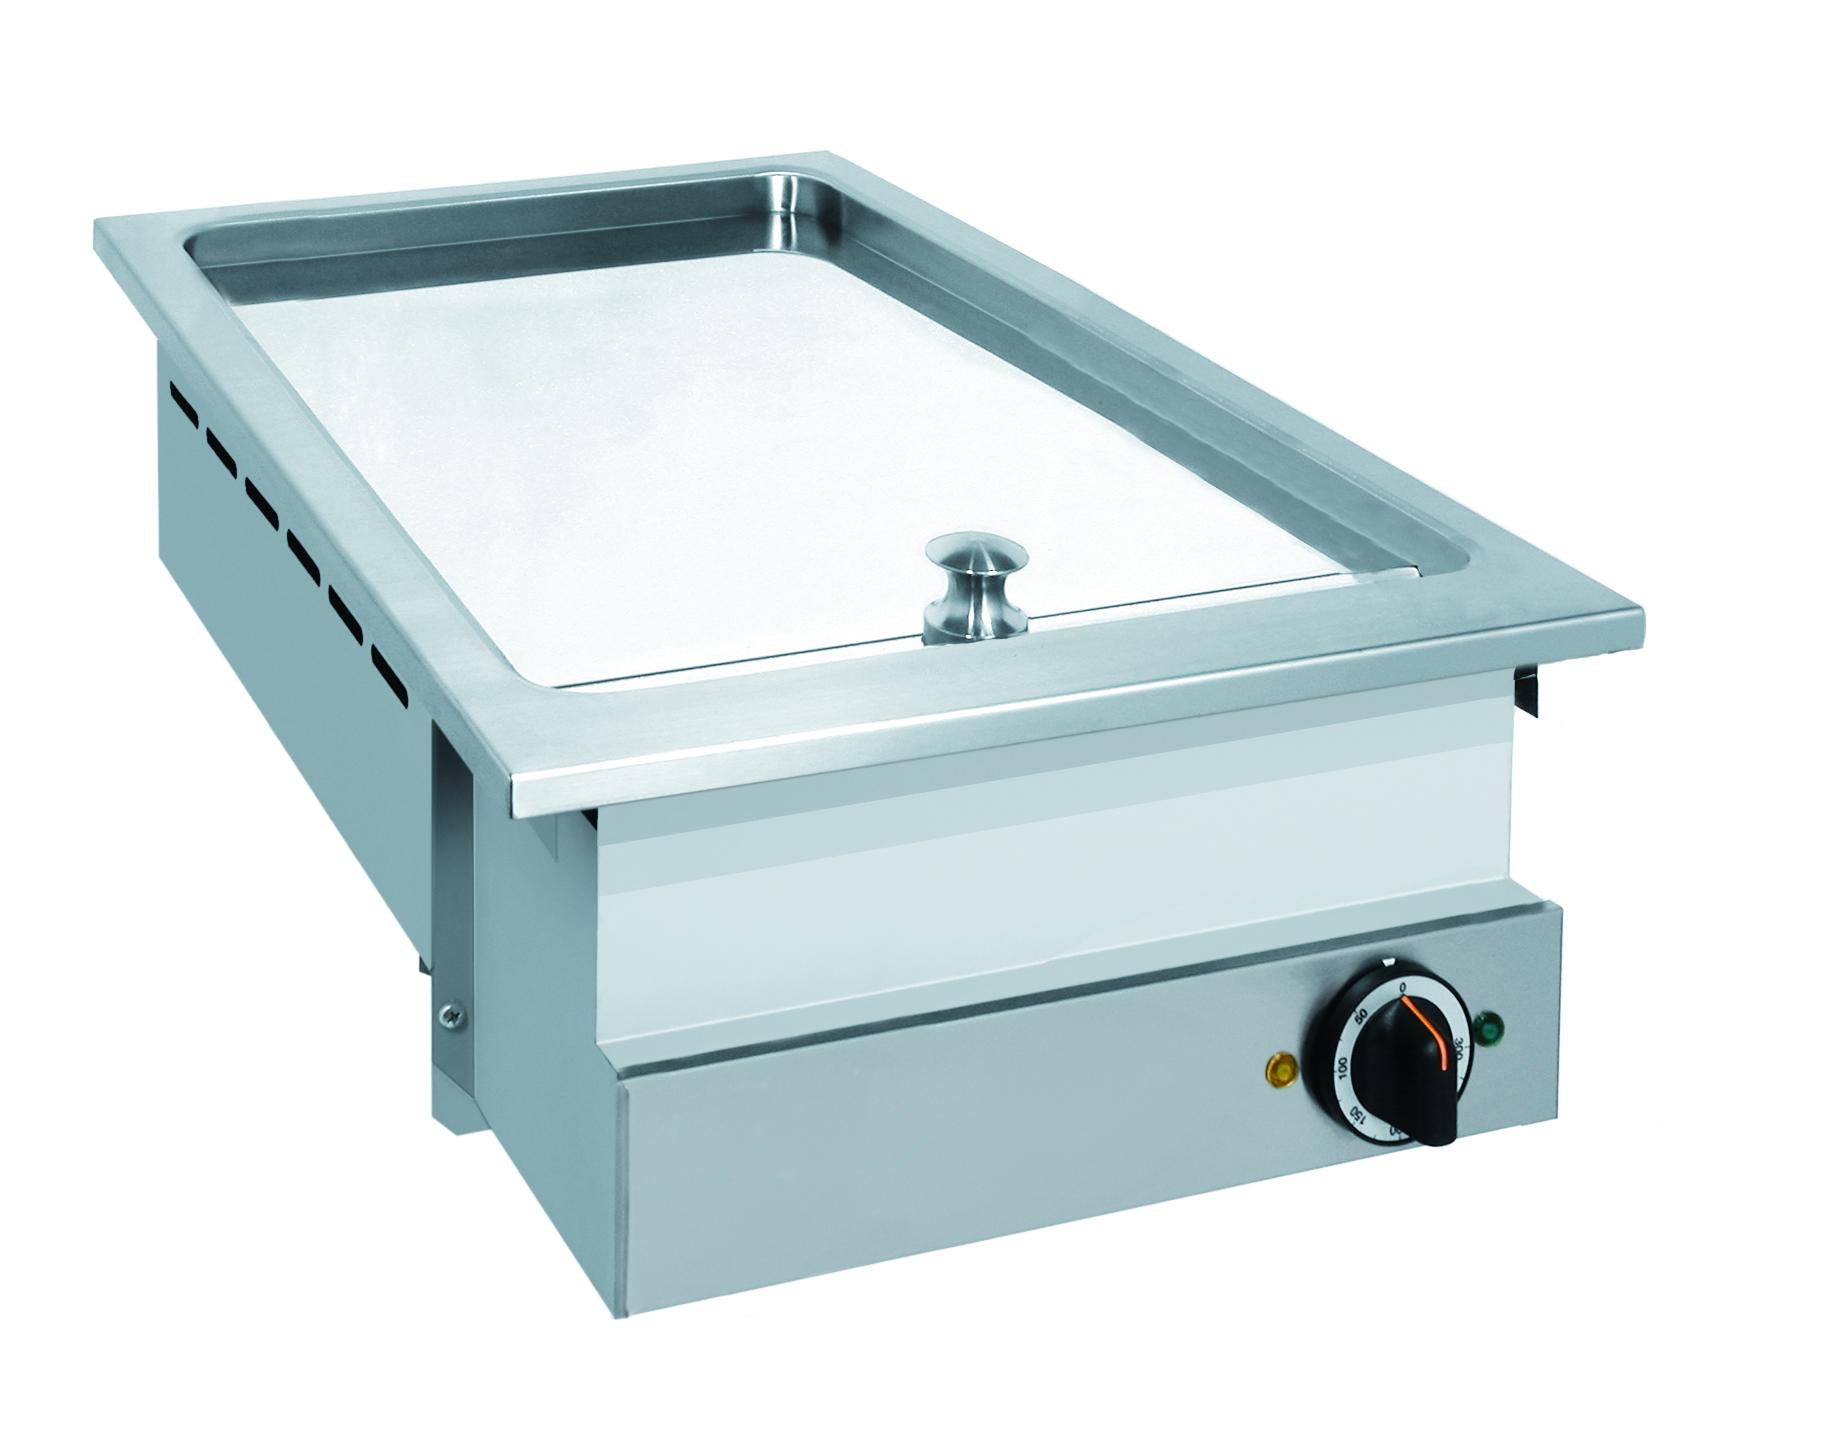 Drop-in / 400 mm glad / 5 kW